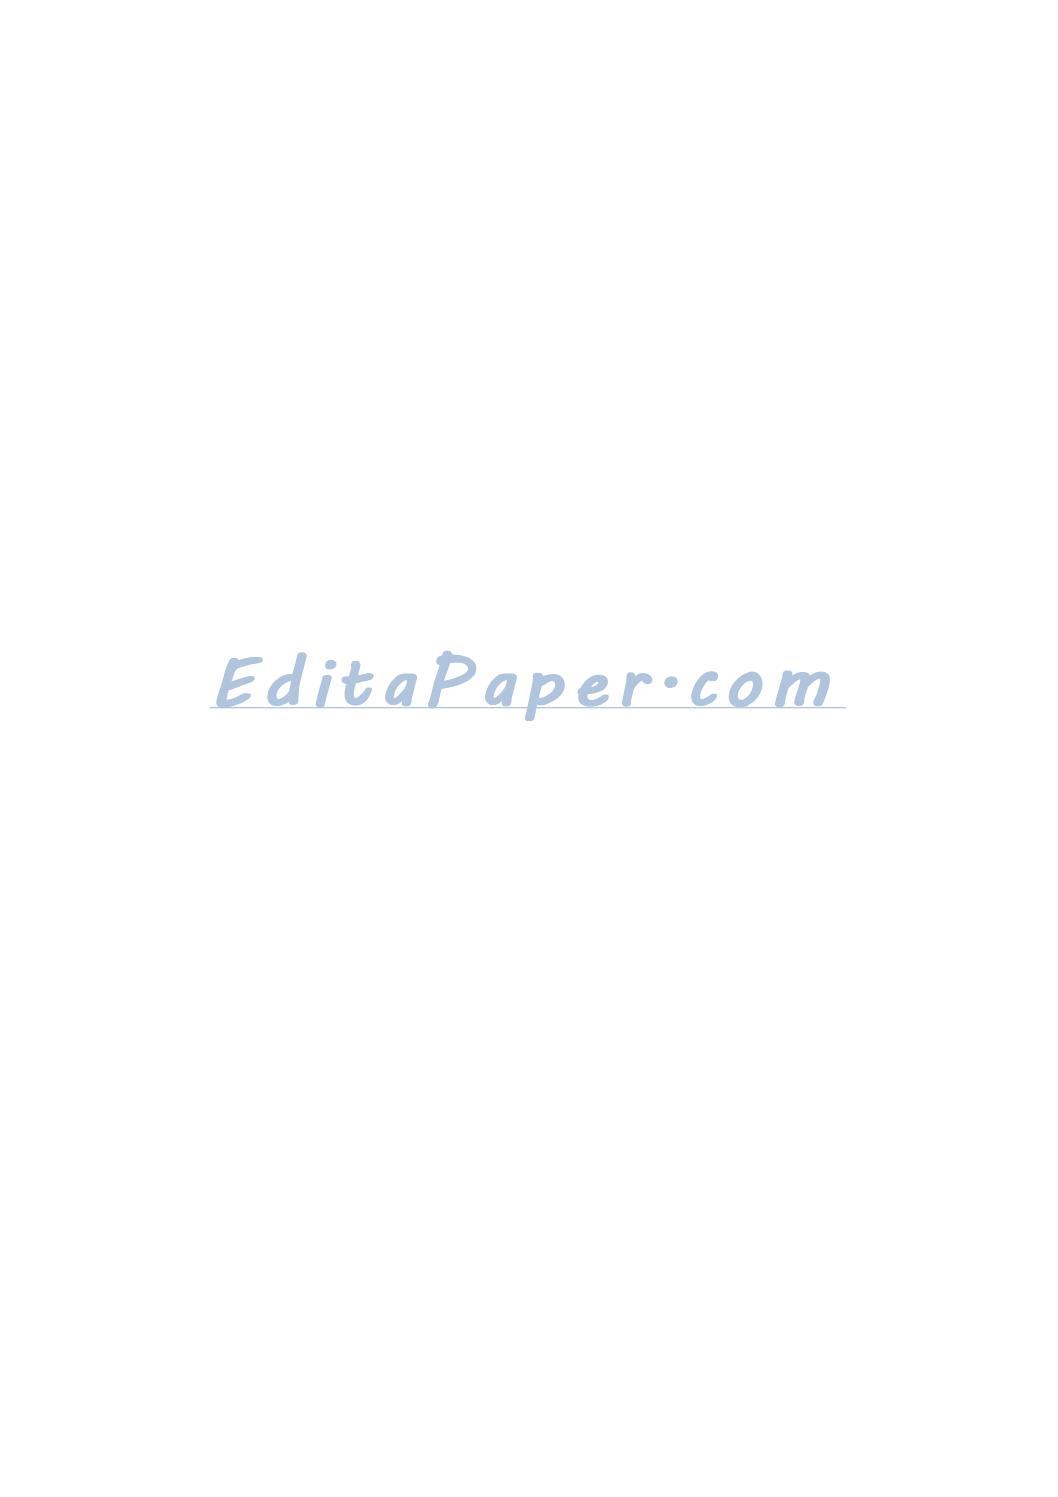 Custom dissertation writer service online